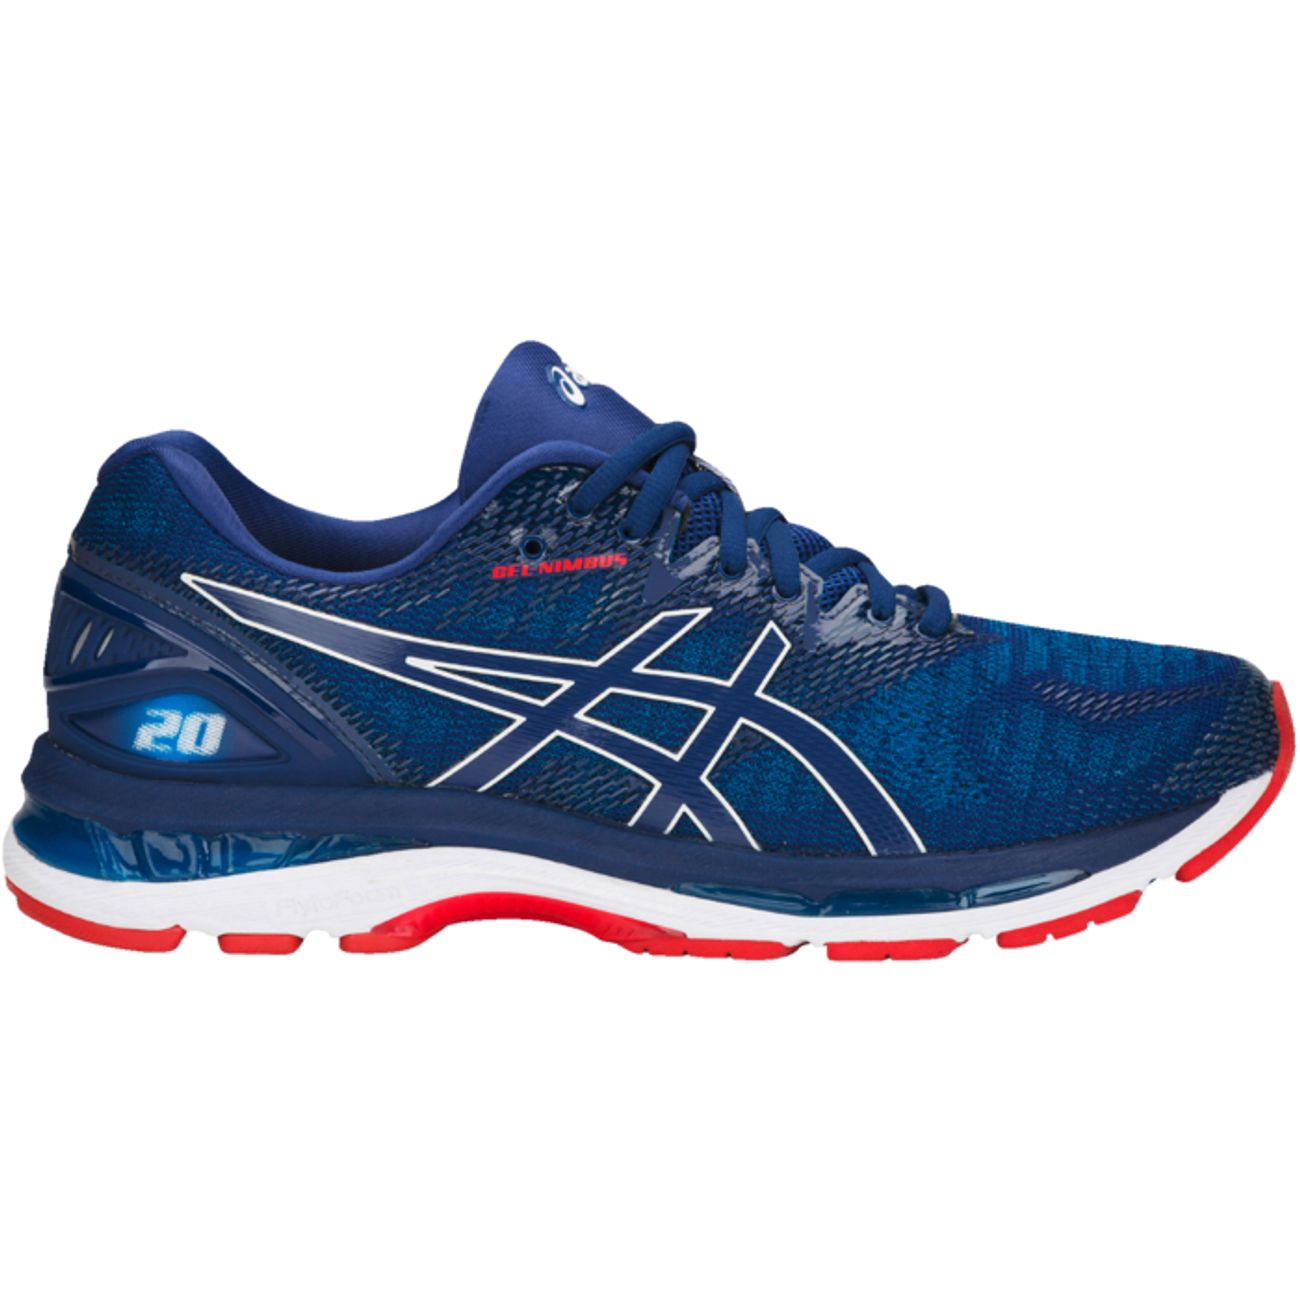 chaussures basses running homme asics gel nimbus 20